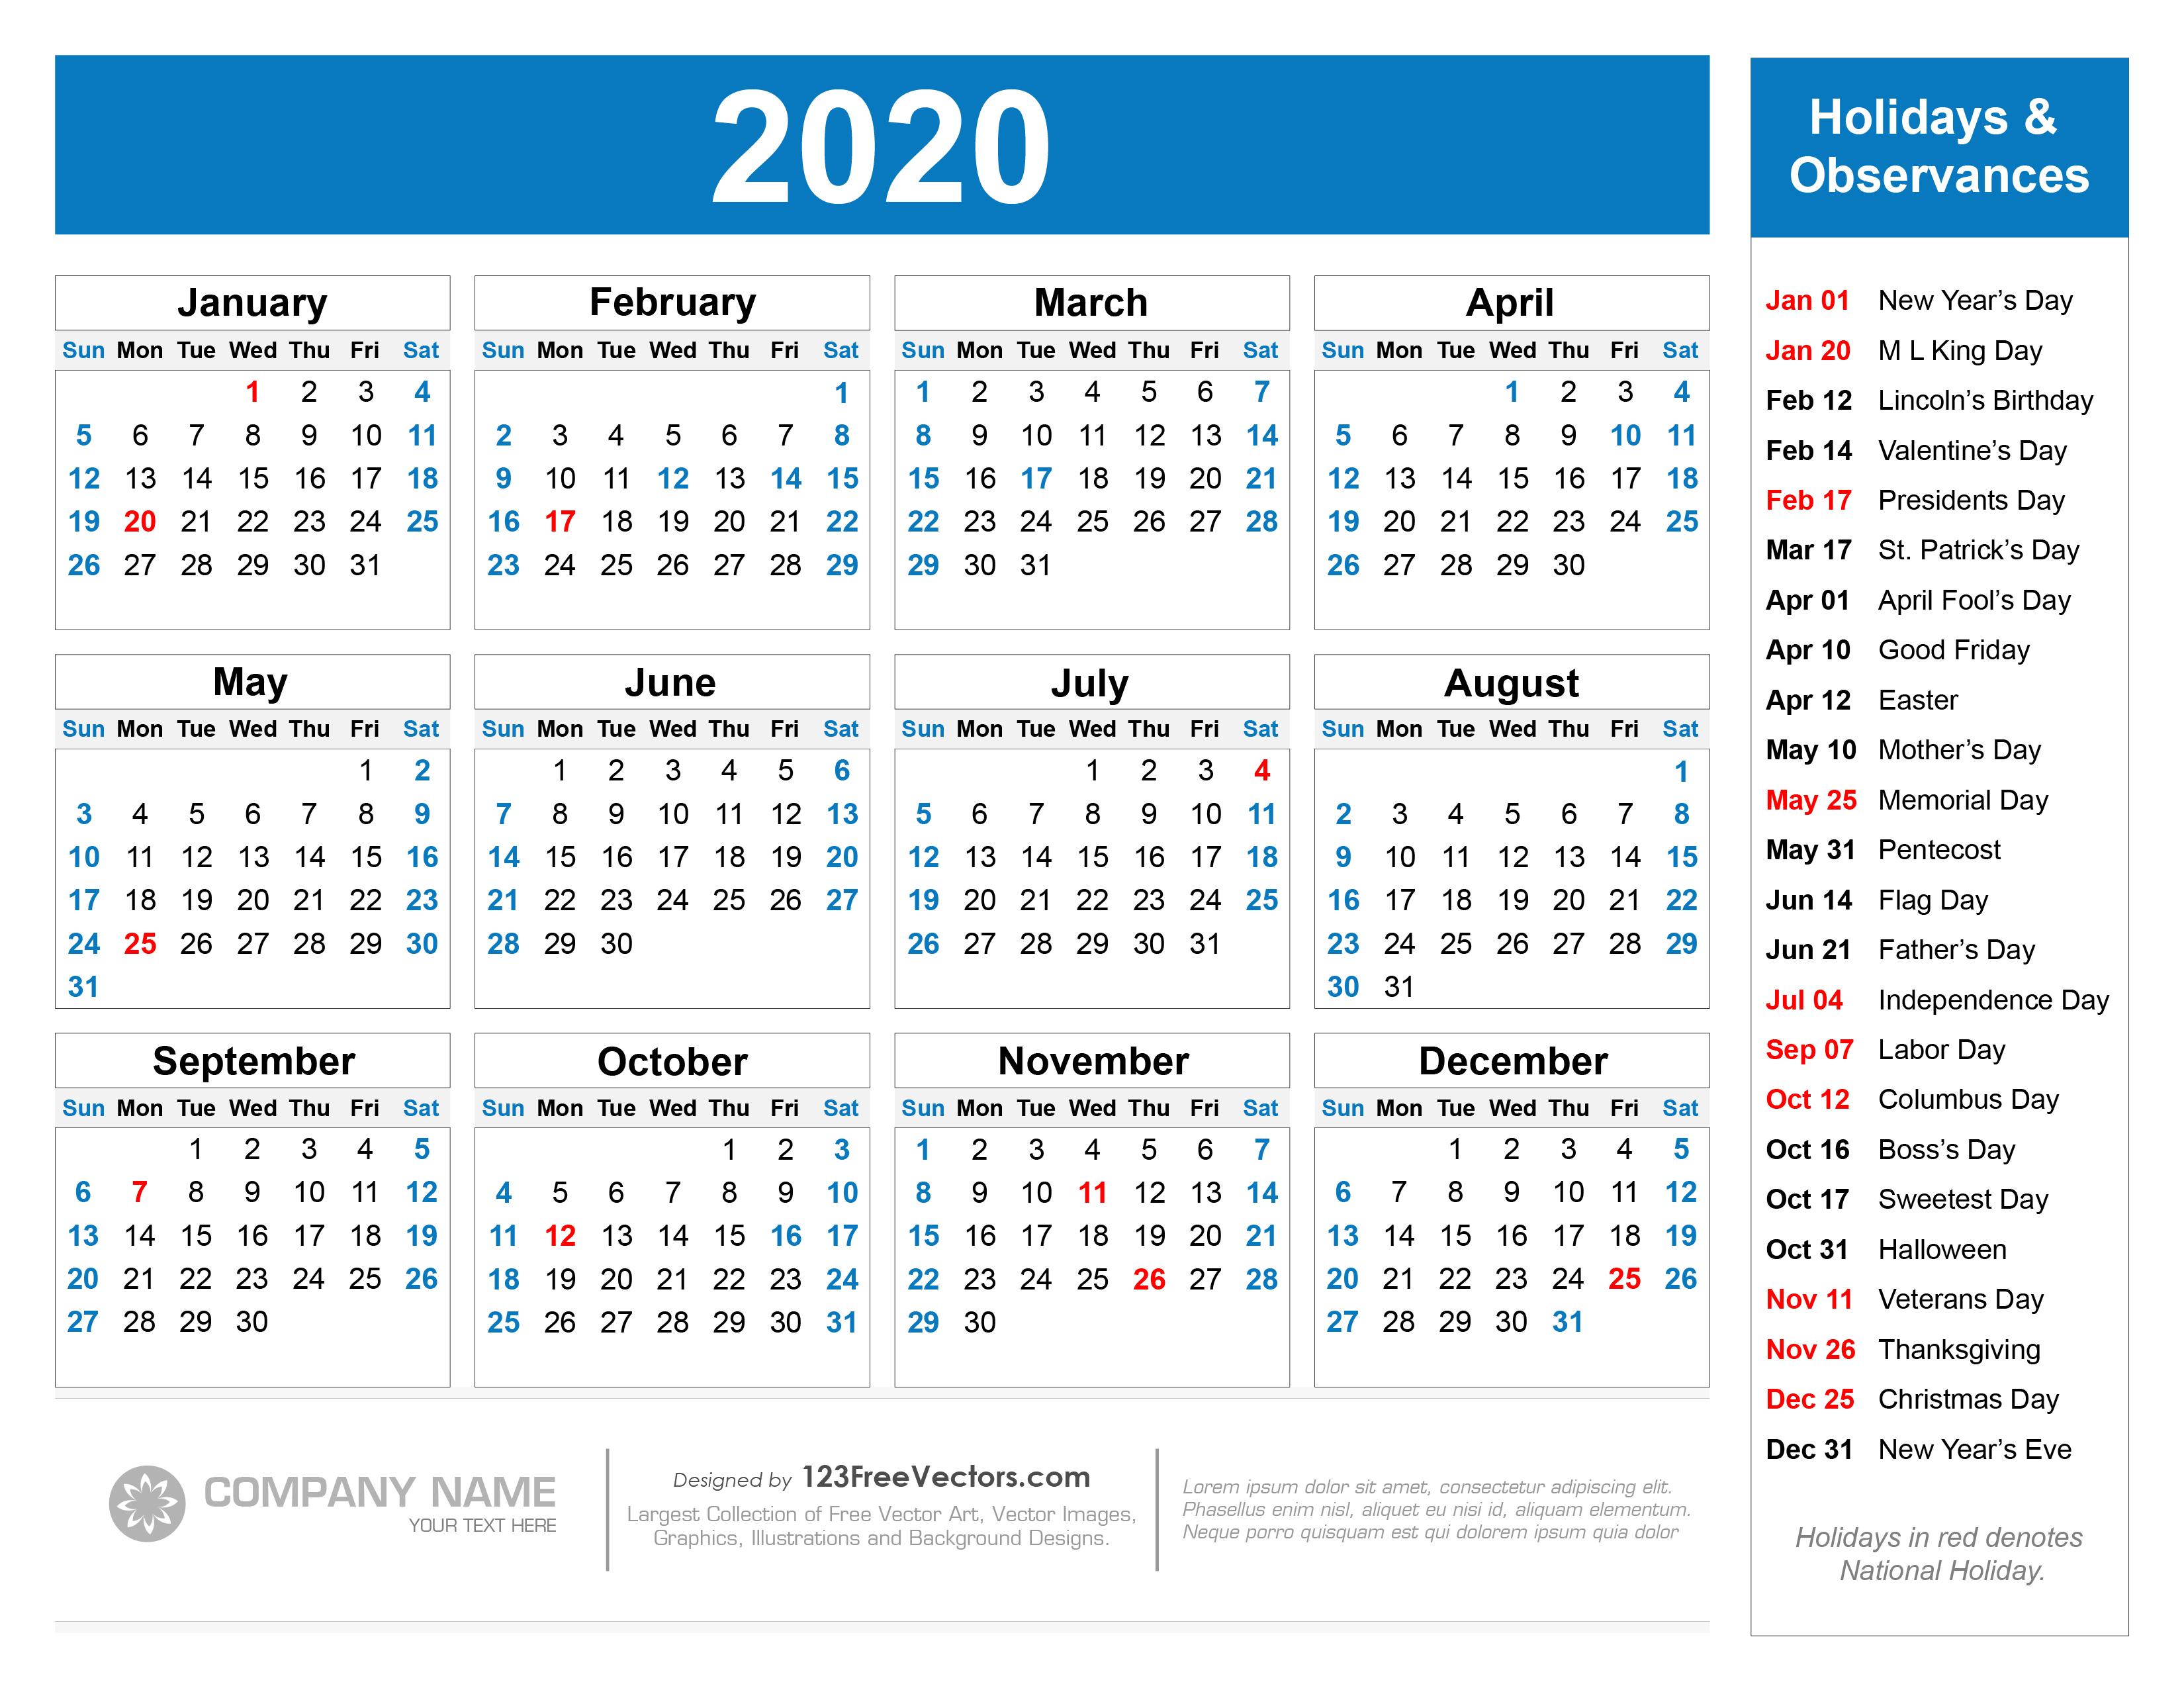 Free Printable 2020 Calendar With Holidays throughout 2020 Calendar With Holidays Printable Free